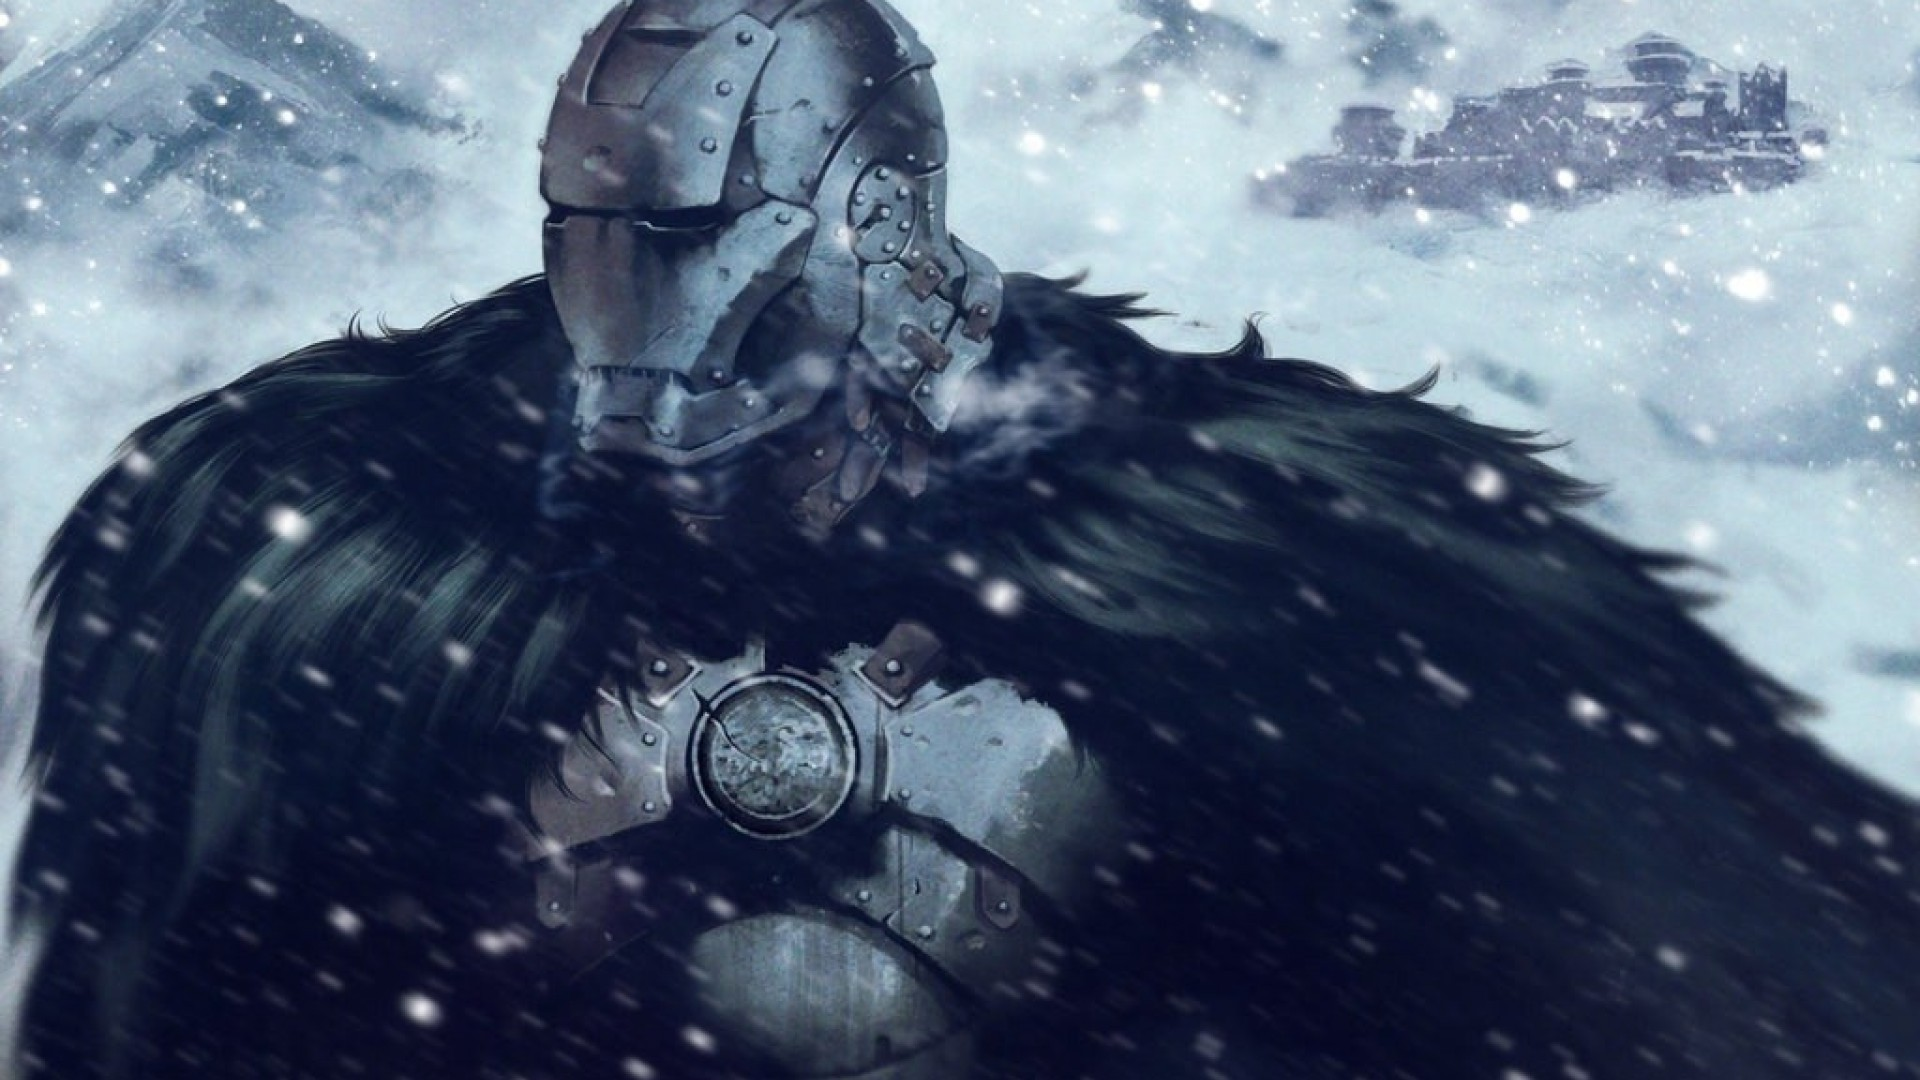 Crossover Snow House Stark Game Of Thrones Iron Man